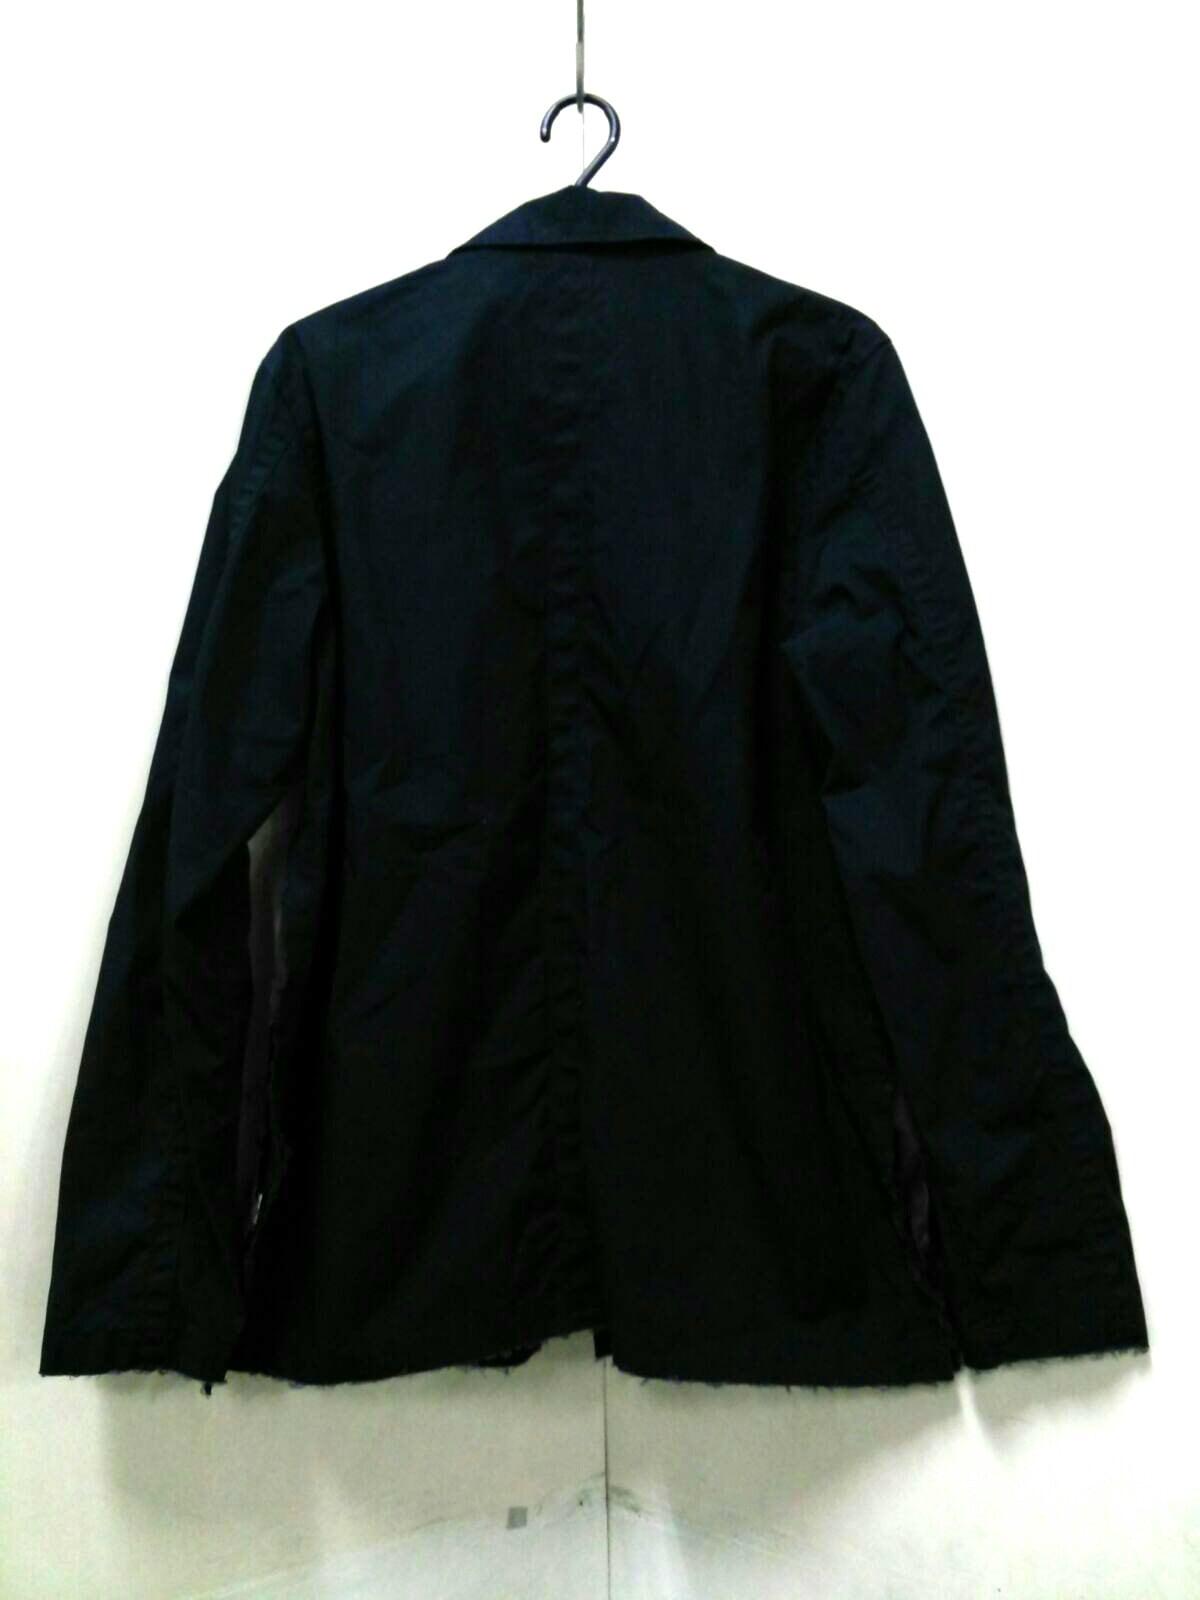 John UNDERCOVER(ジョンアンダーカバー)のコート